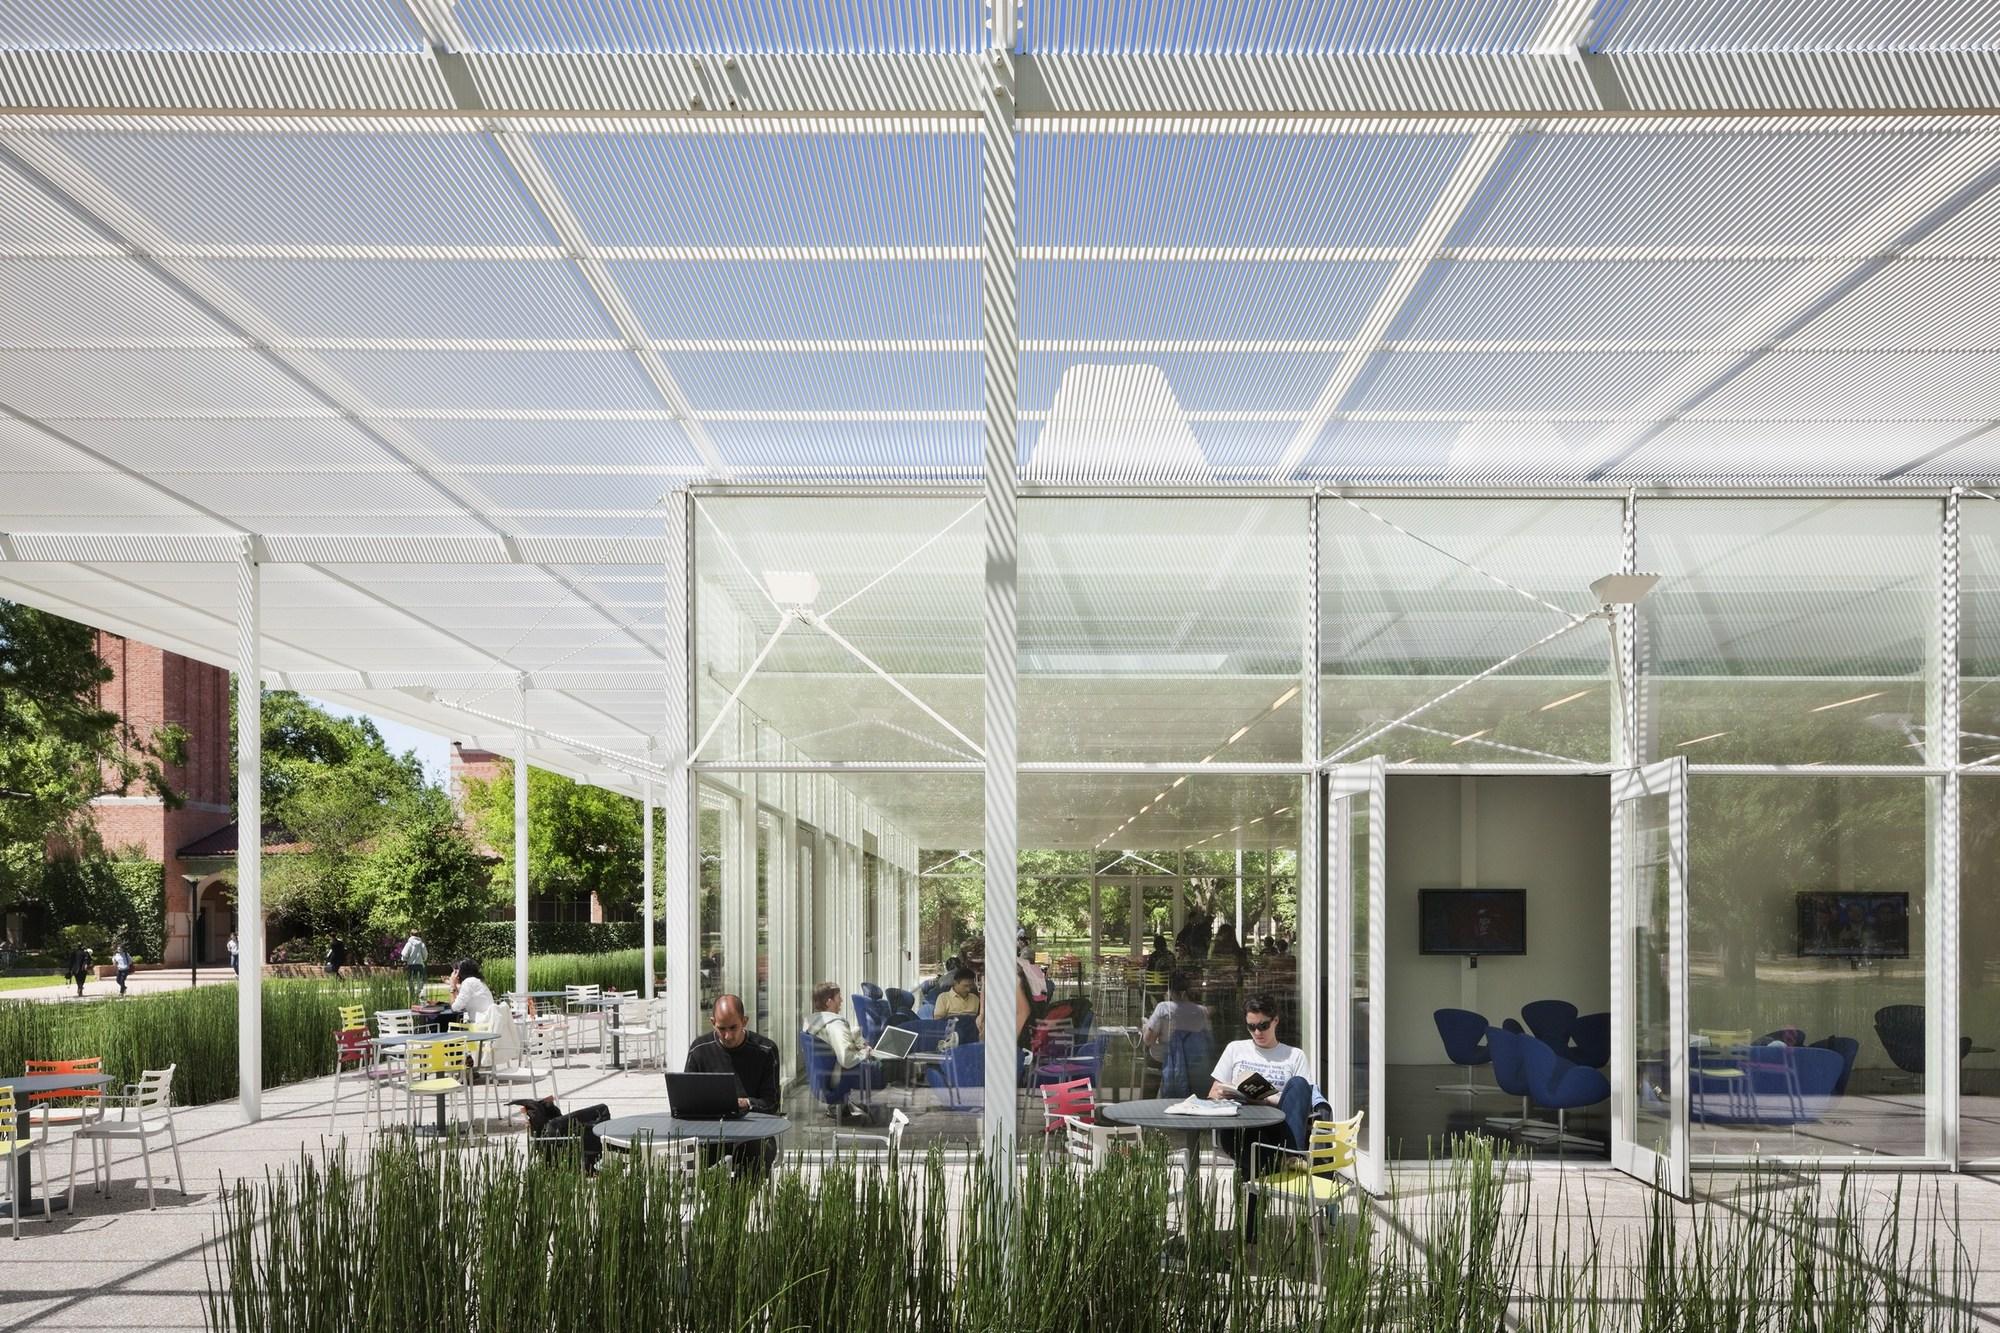 Brochstein Pavilion Thomas Phifer And Partners